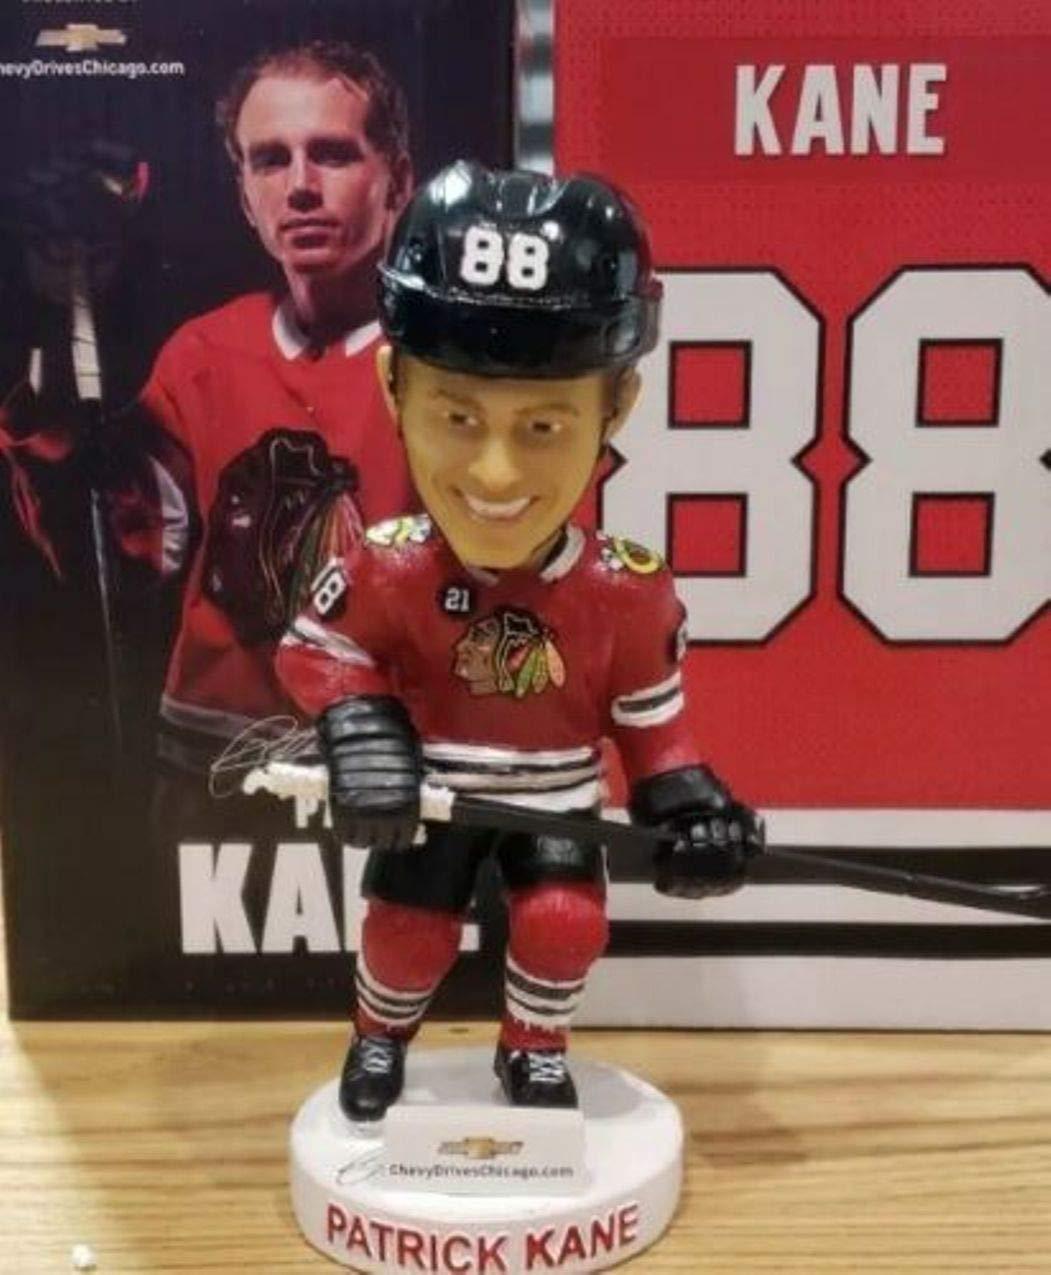 2019 Chicago Blackhawks Patrick Kane Bobblehead SGA 1-22-19 Brand New in Box!